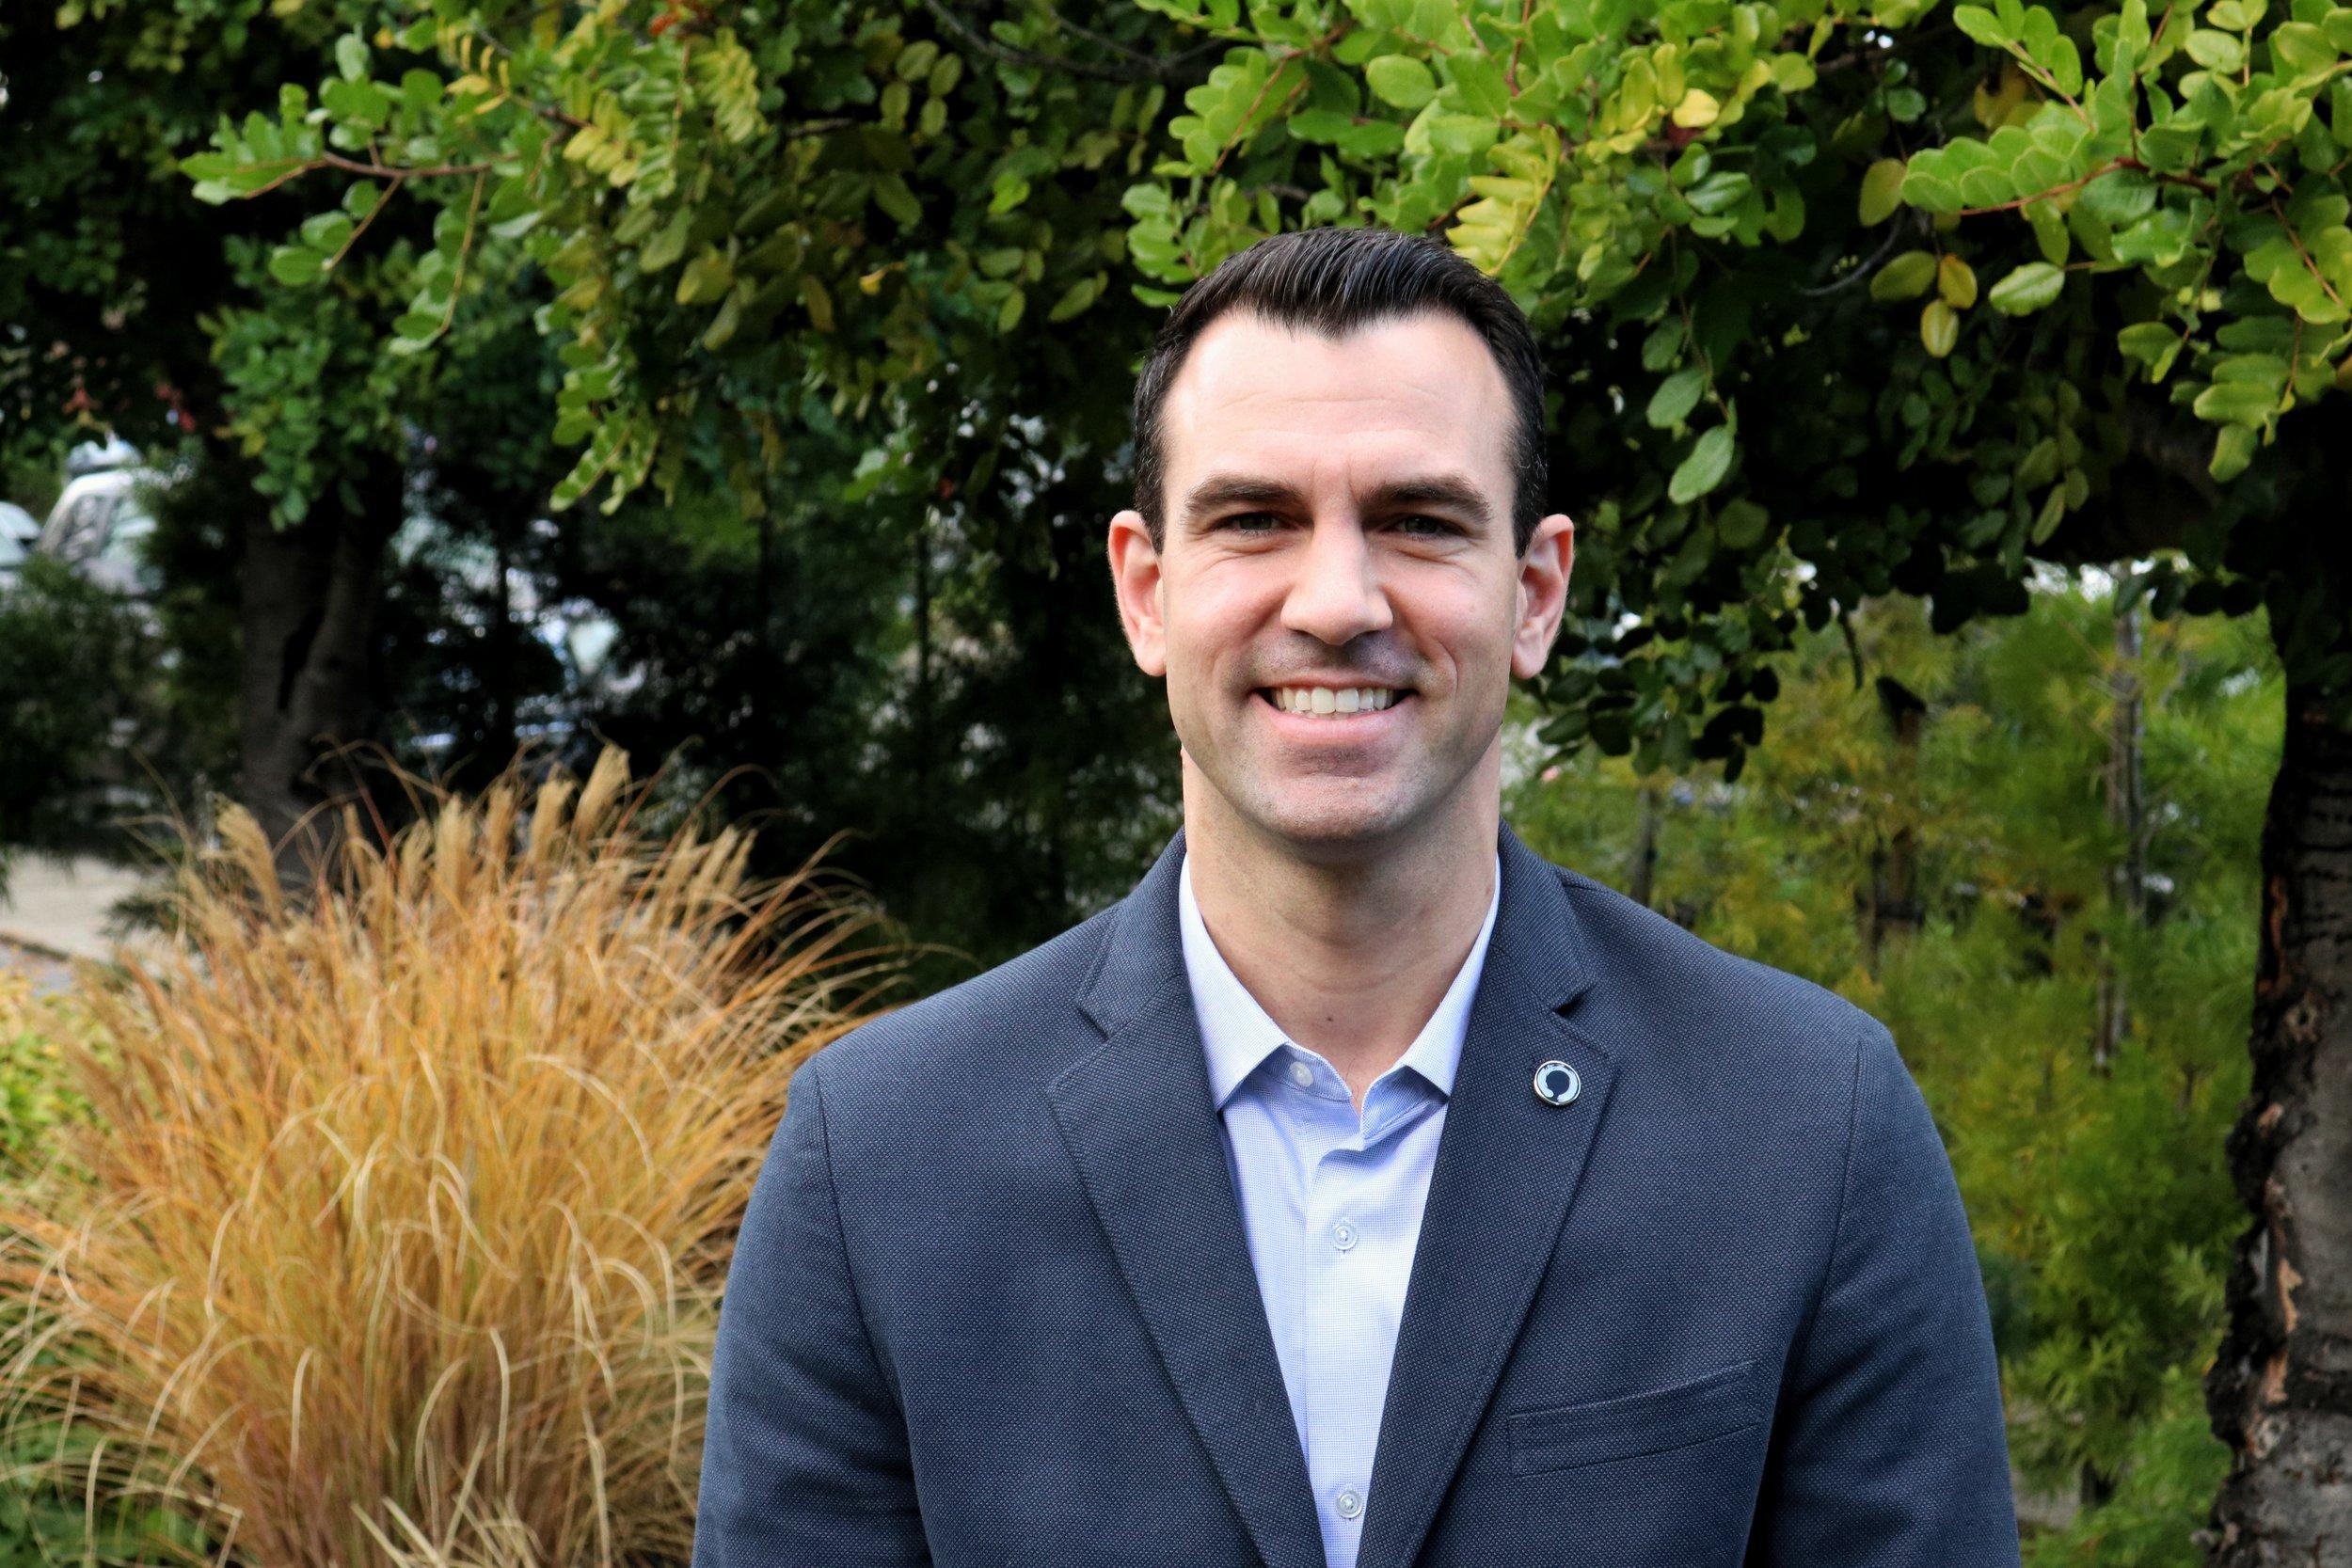 Kyle Blotzer, Director of Operations